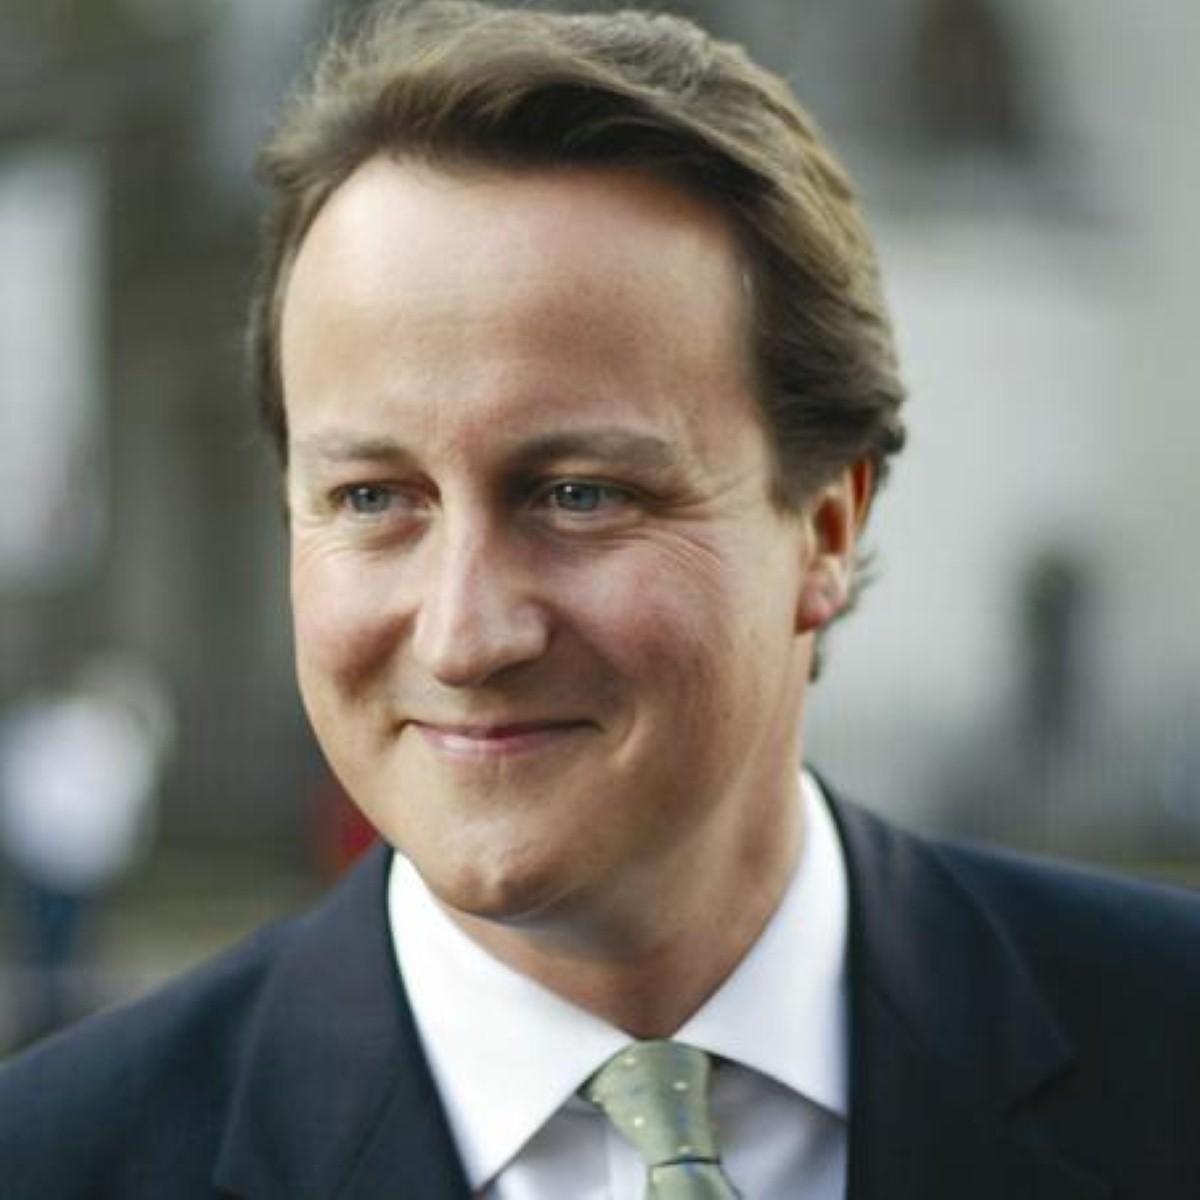 Cameron prison speech in full